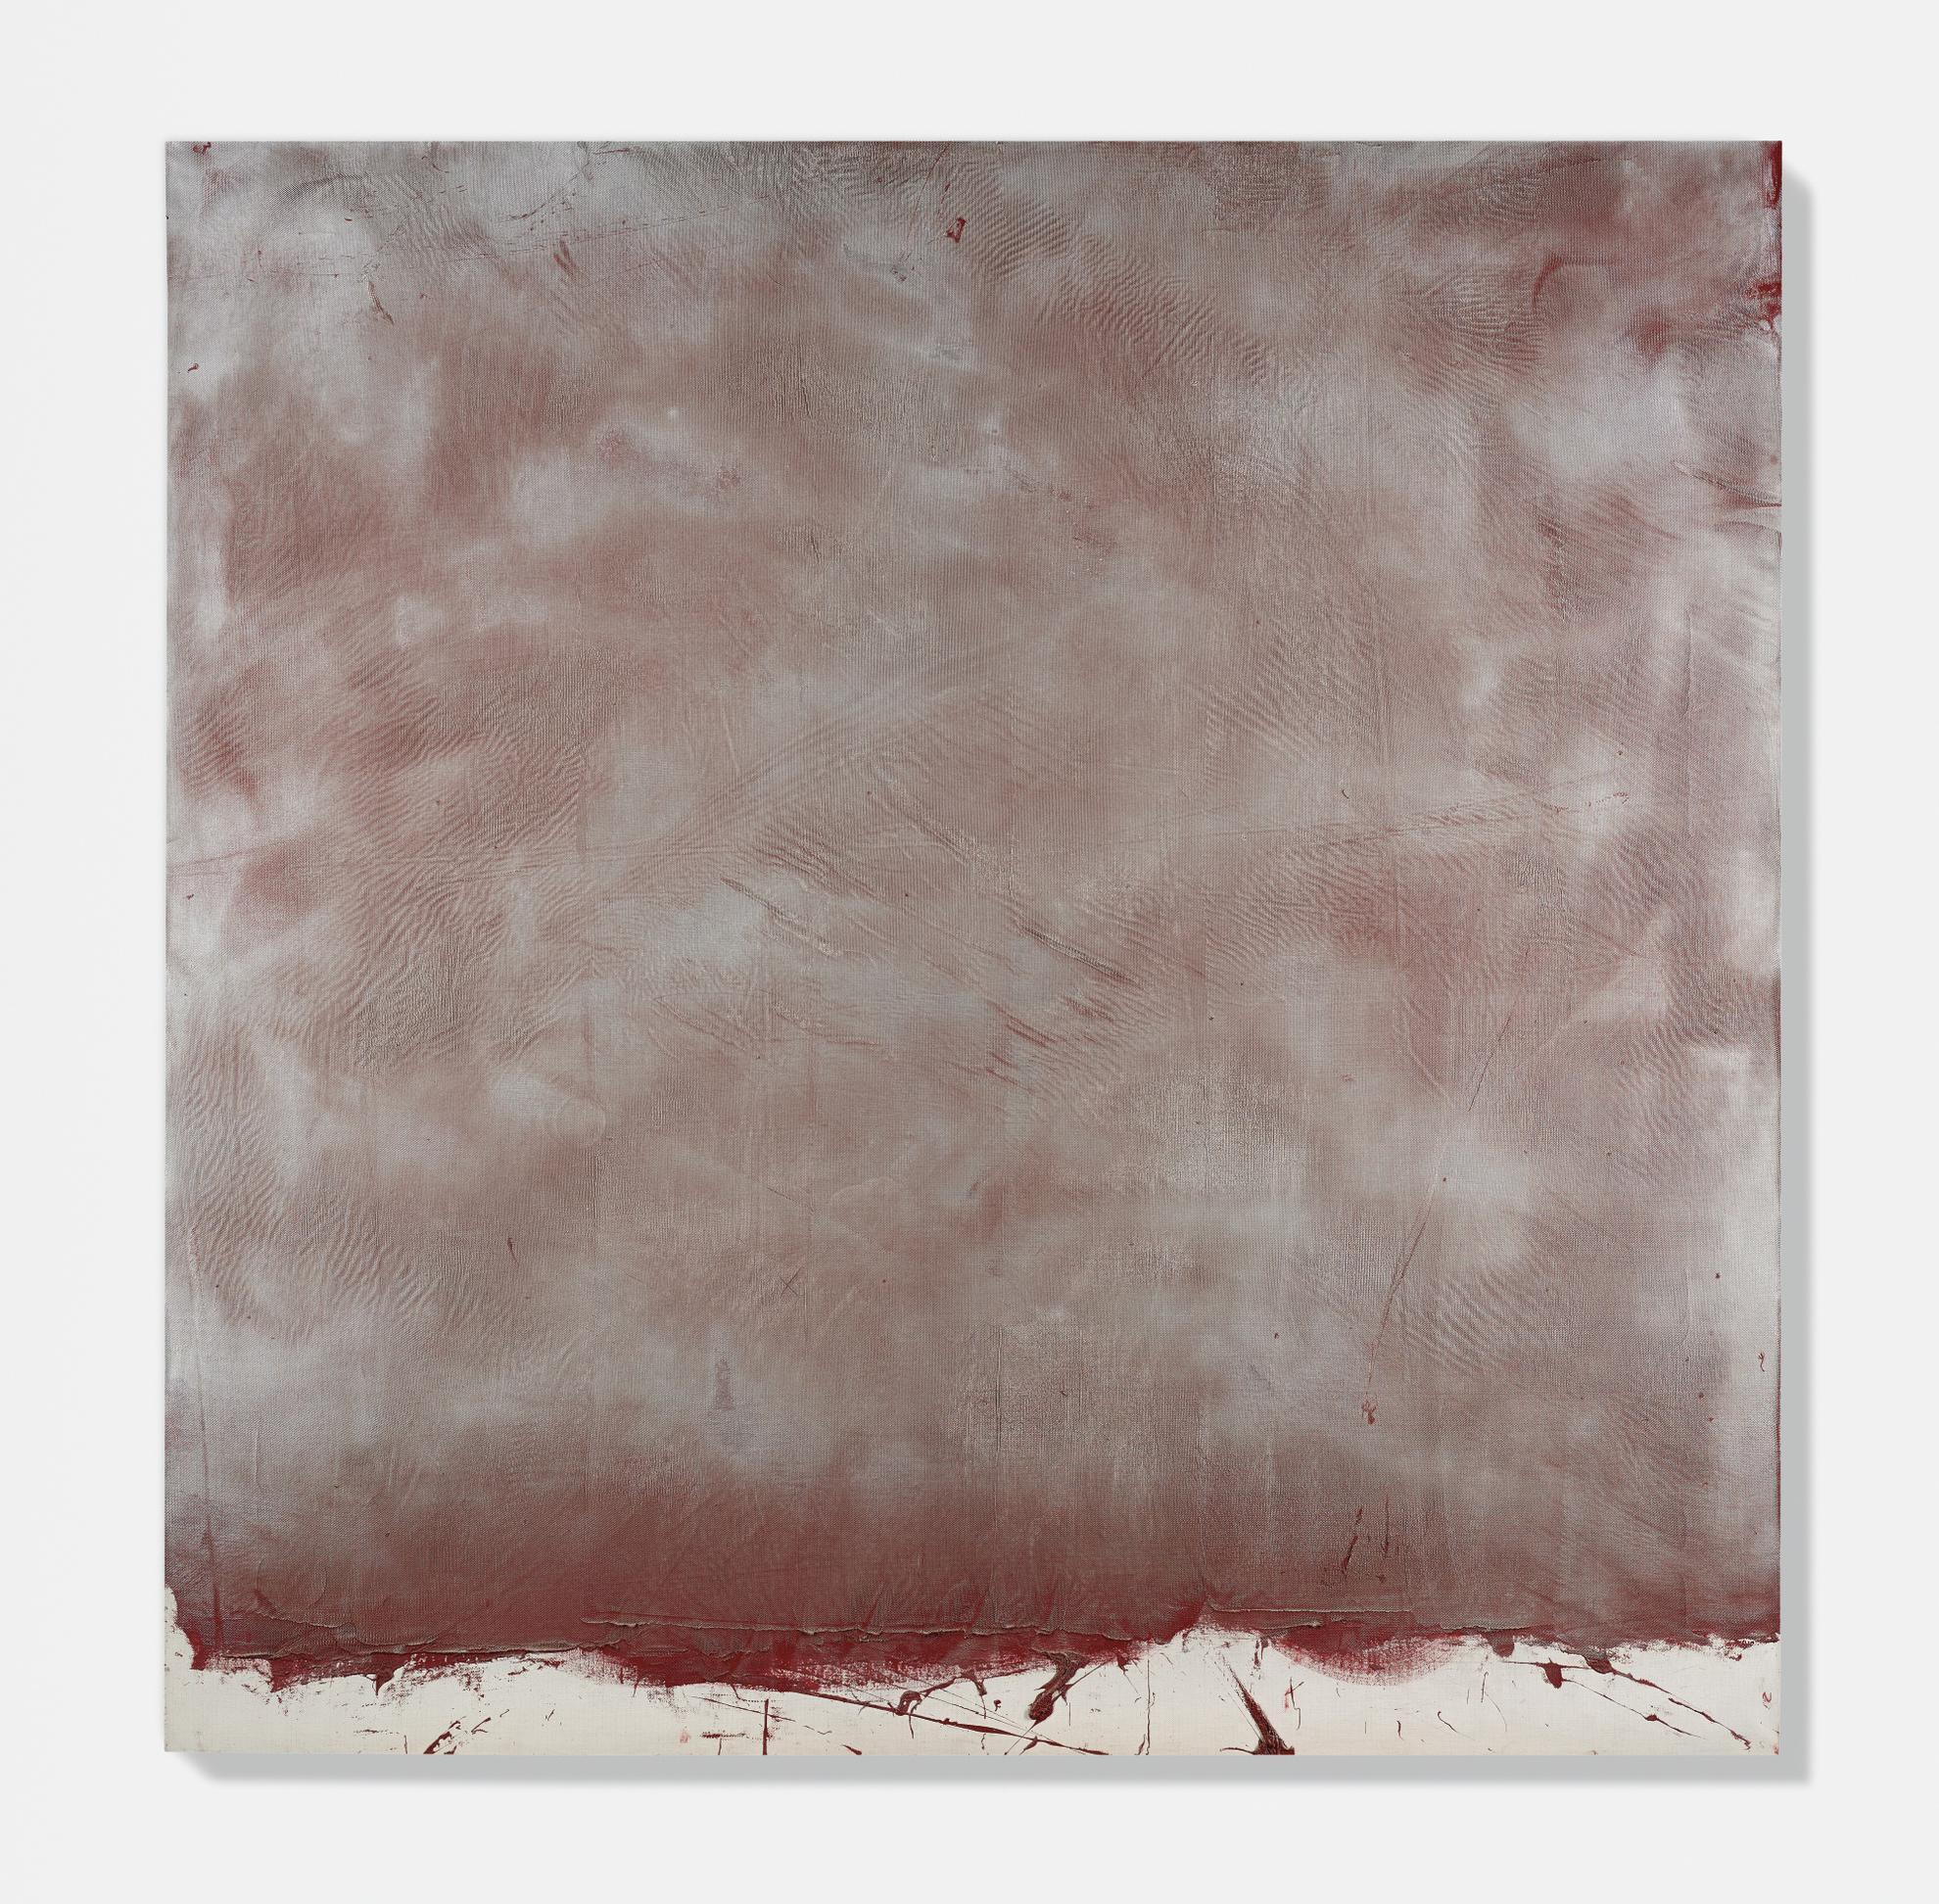 Rudolf Stingel-Untitled-1991